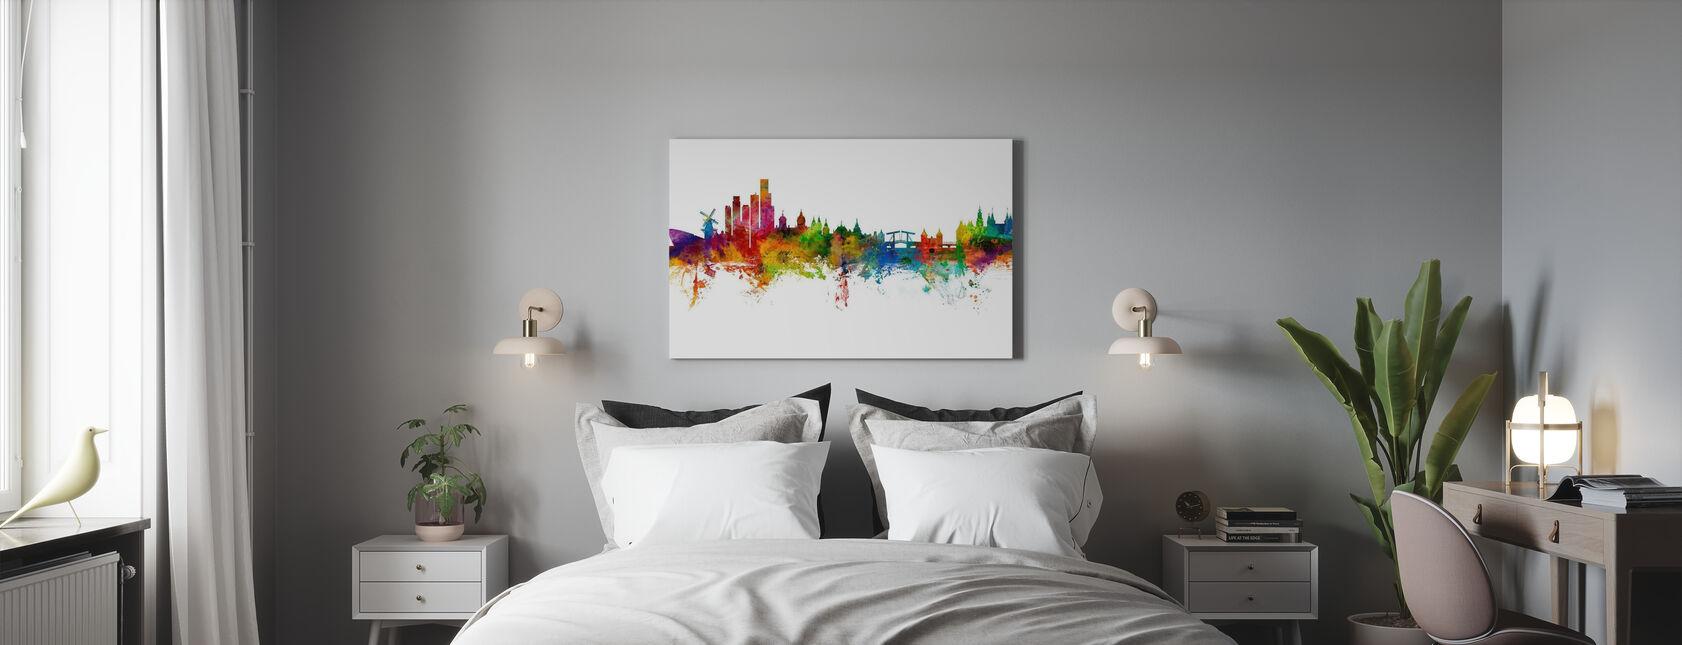 Amsterdamse Skyline windmolen - Canvas print - Slaapkamer